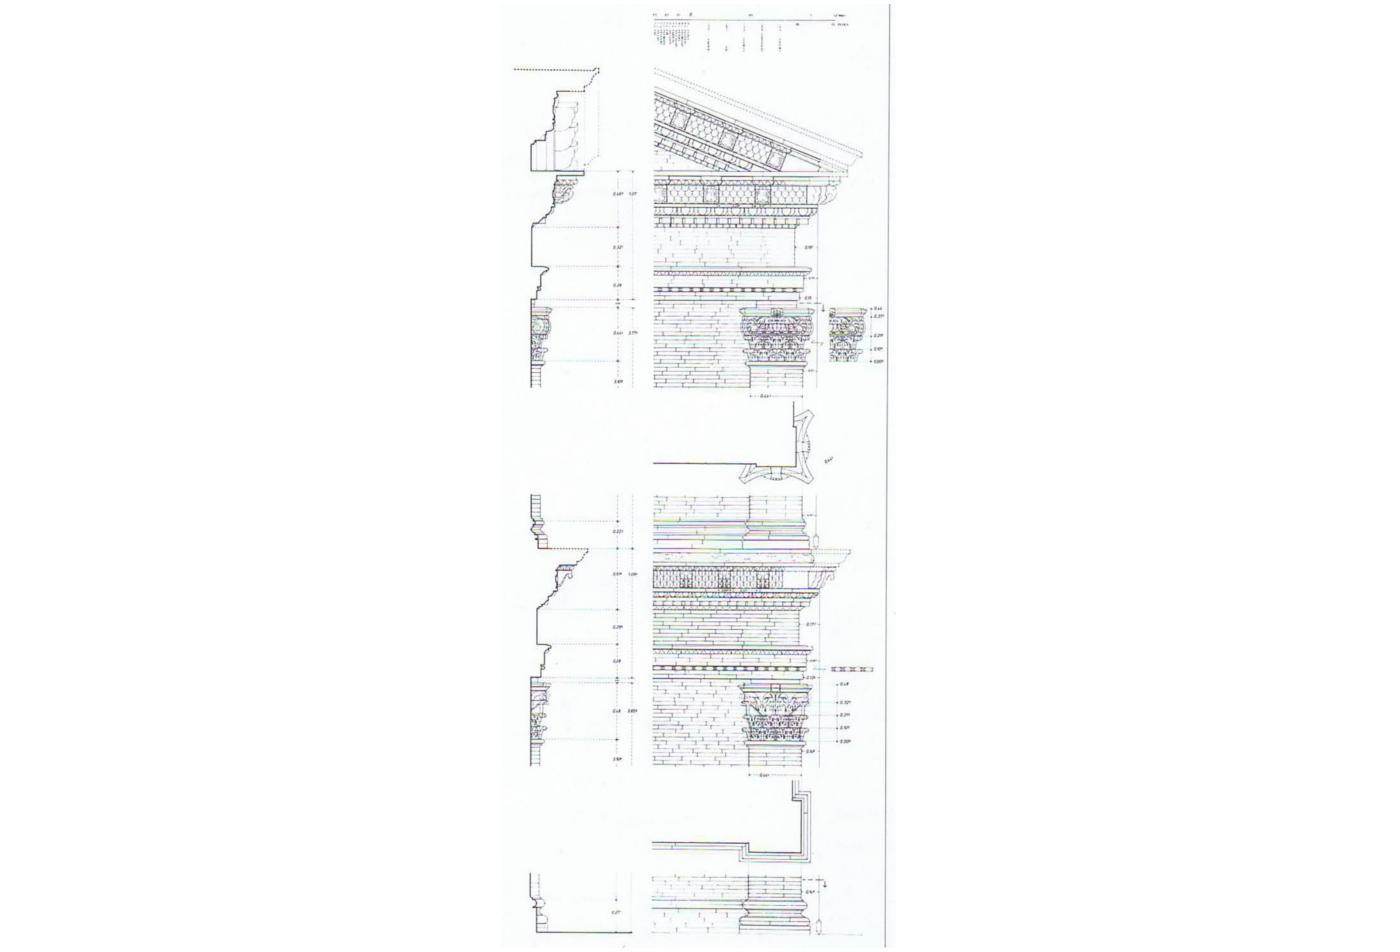 testo d'esempio 2